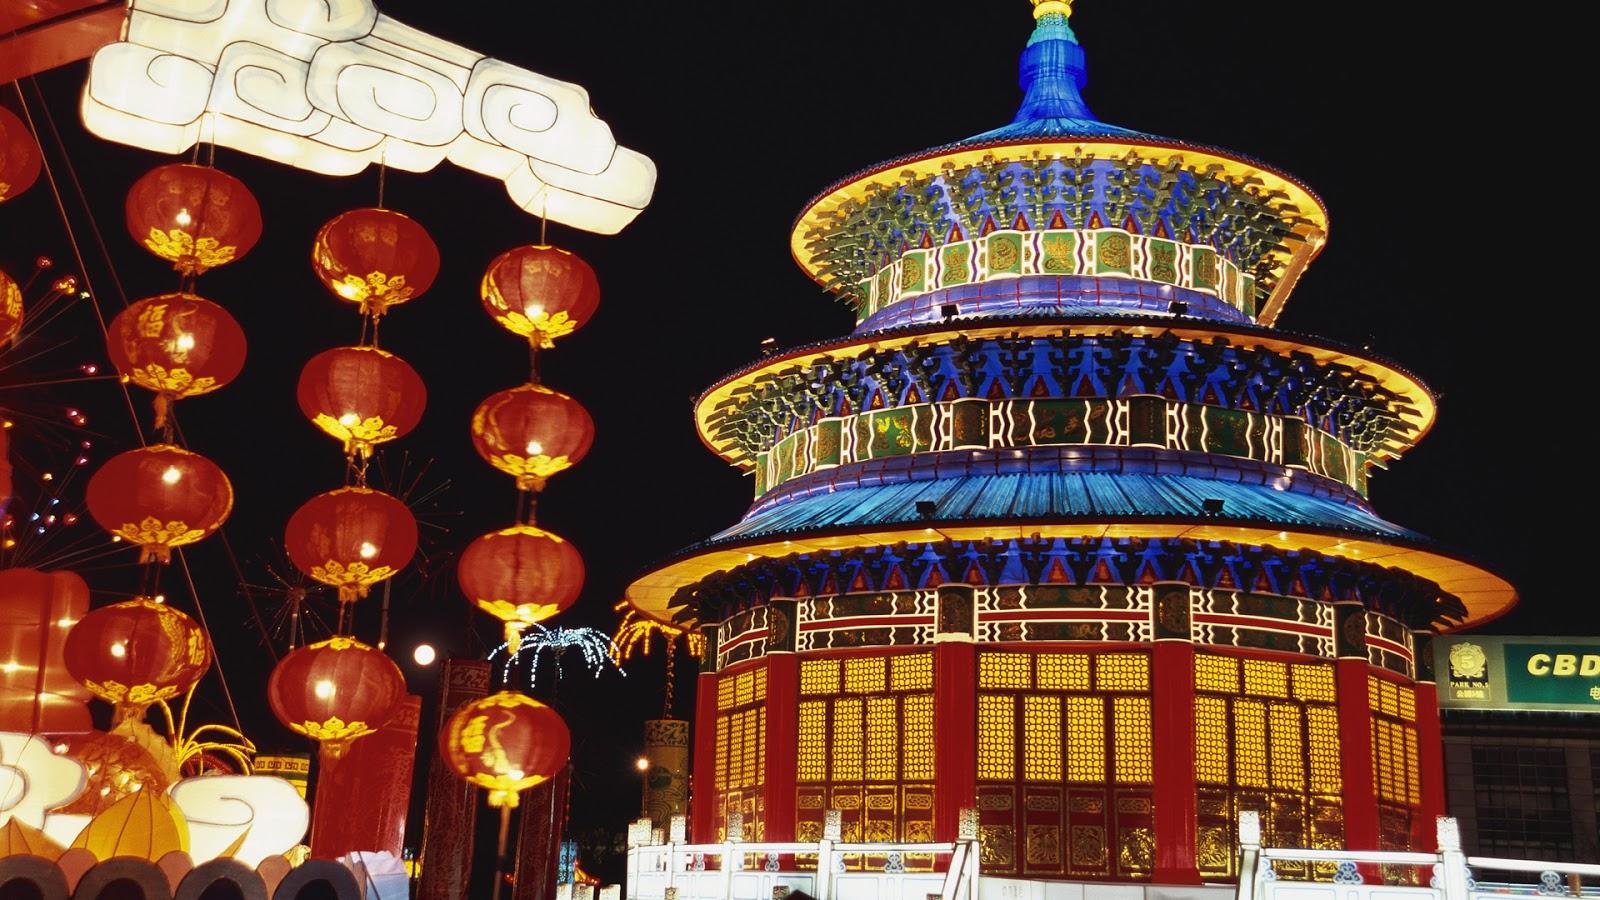 ben aquila 39 s blog chinese lantern festival 2013. Black Bedroom Furniture Sets. Home Design Ideas